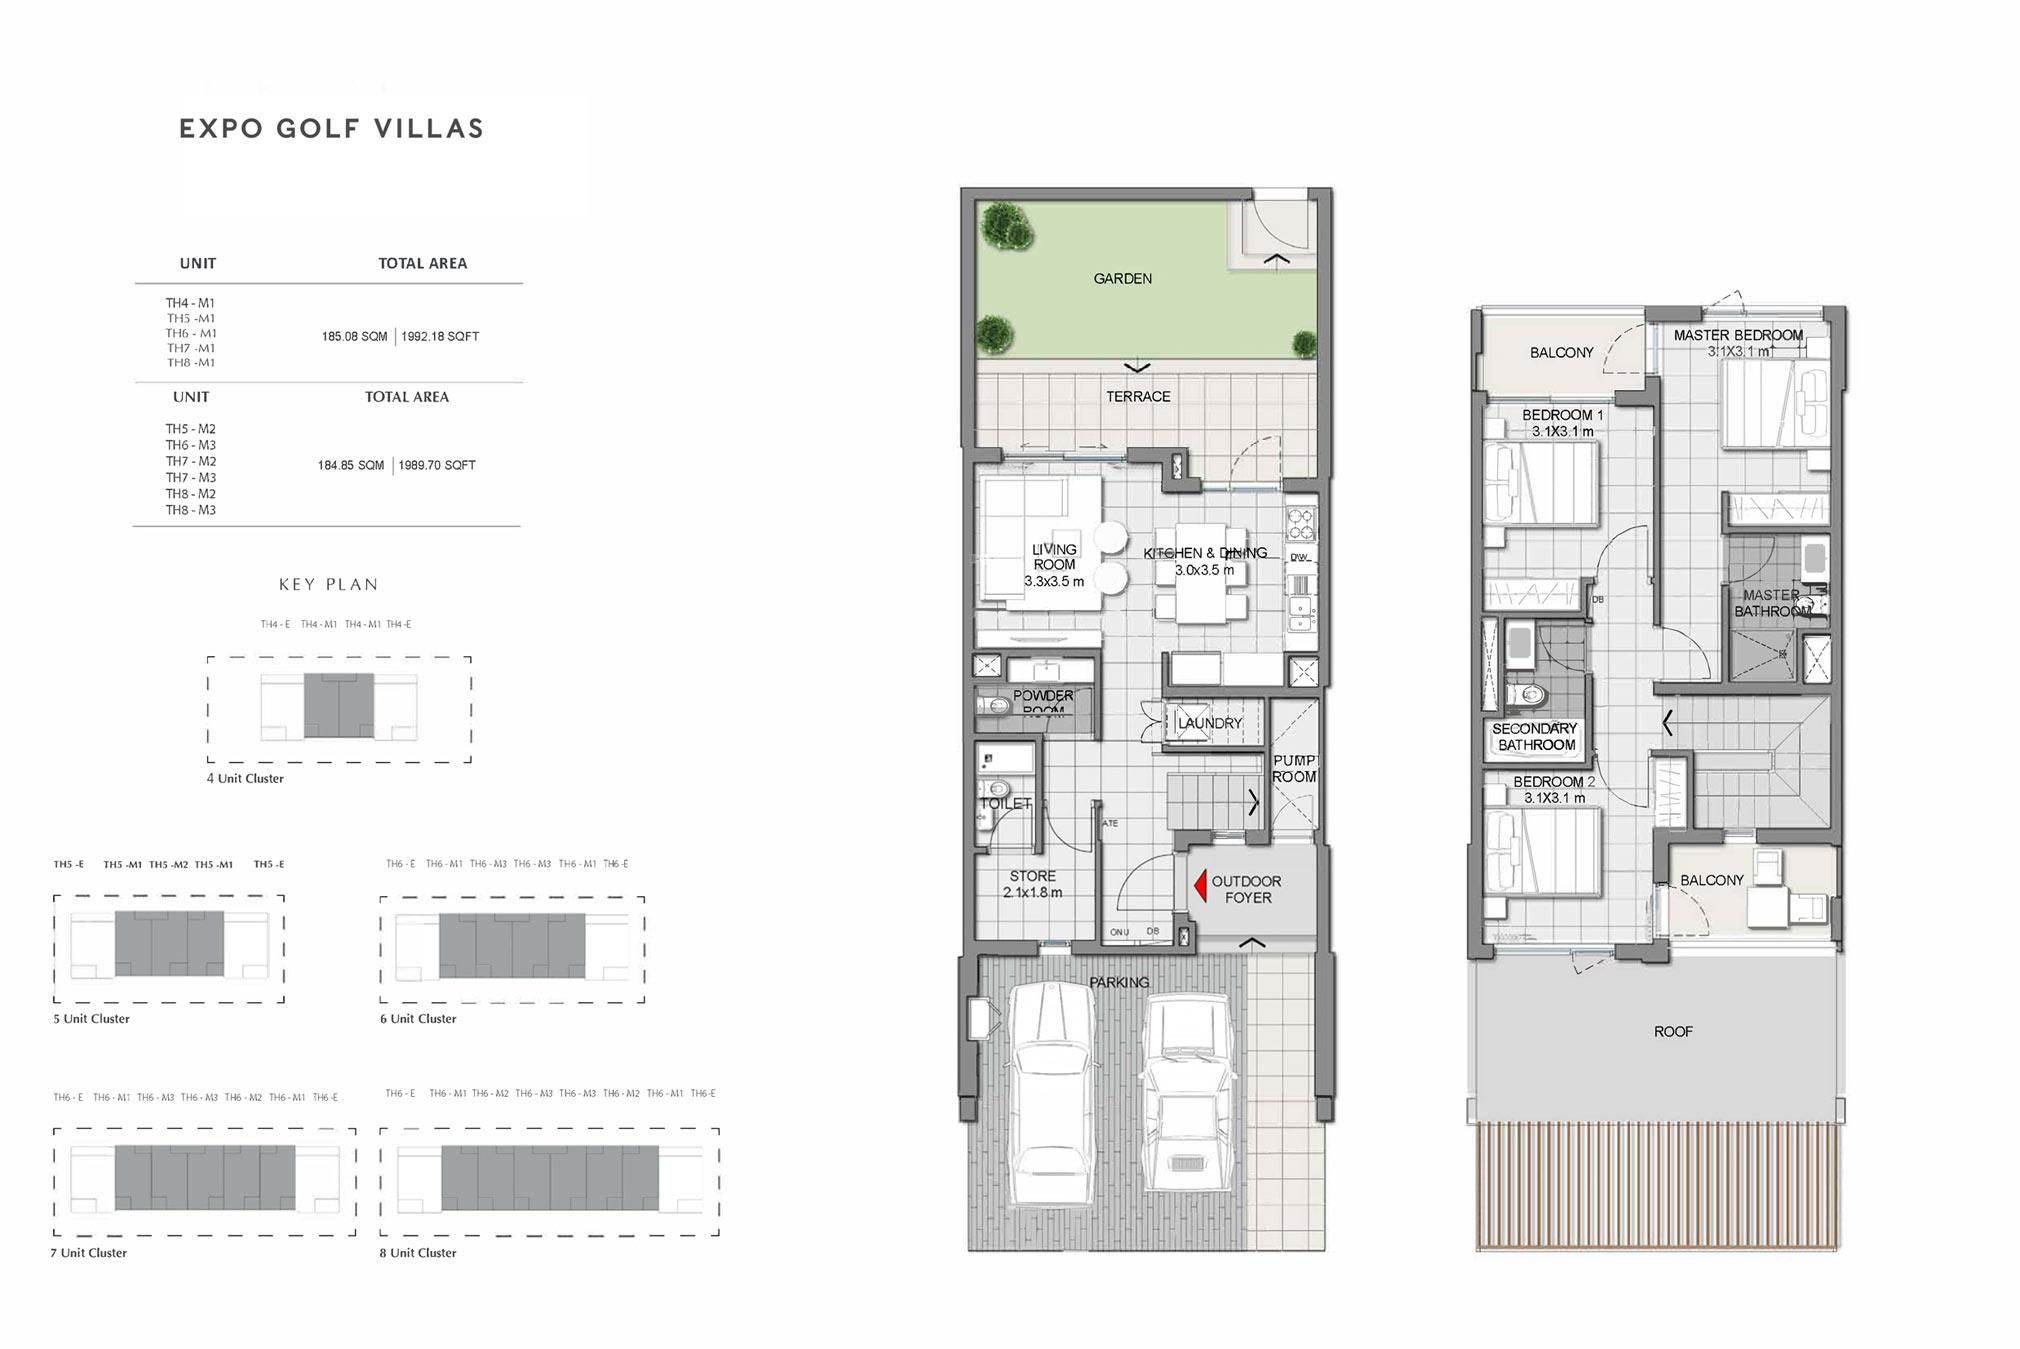 3 Bedroom Villas Size 1989 to 1992 Sq Ft